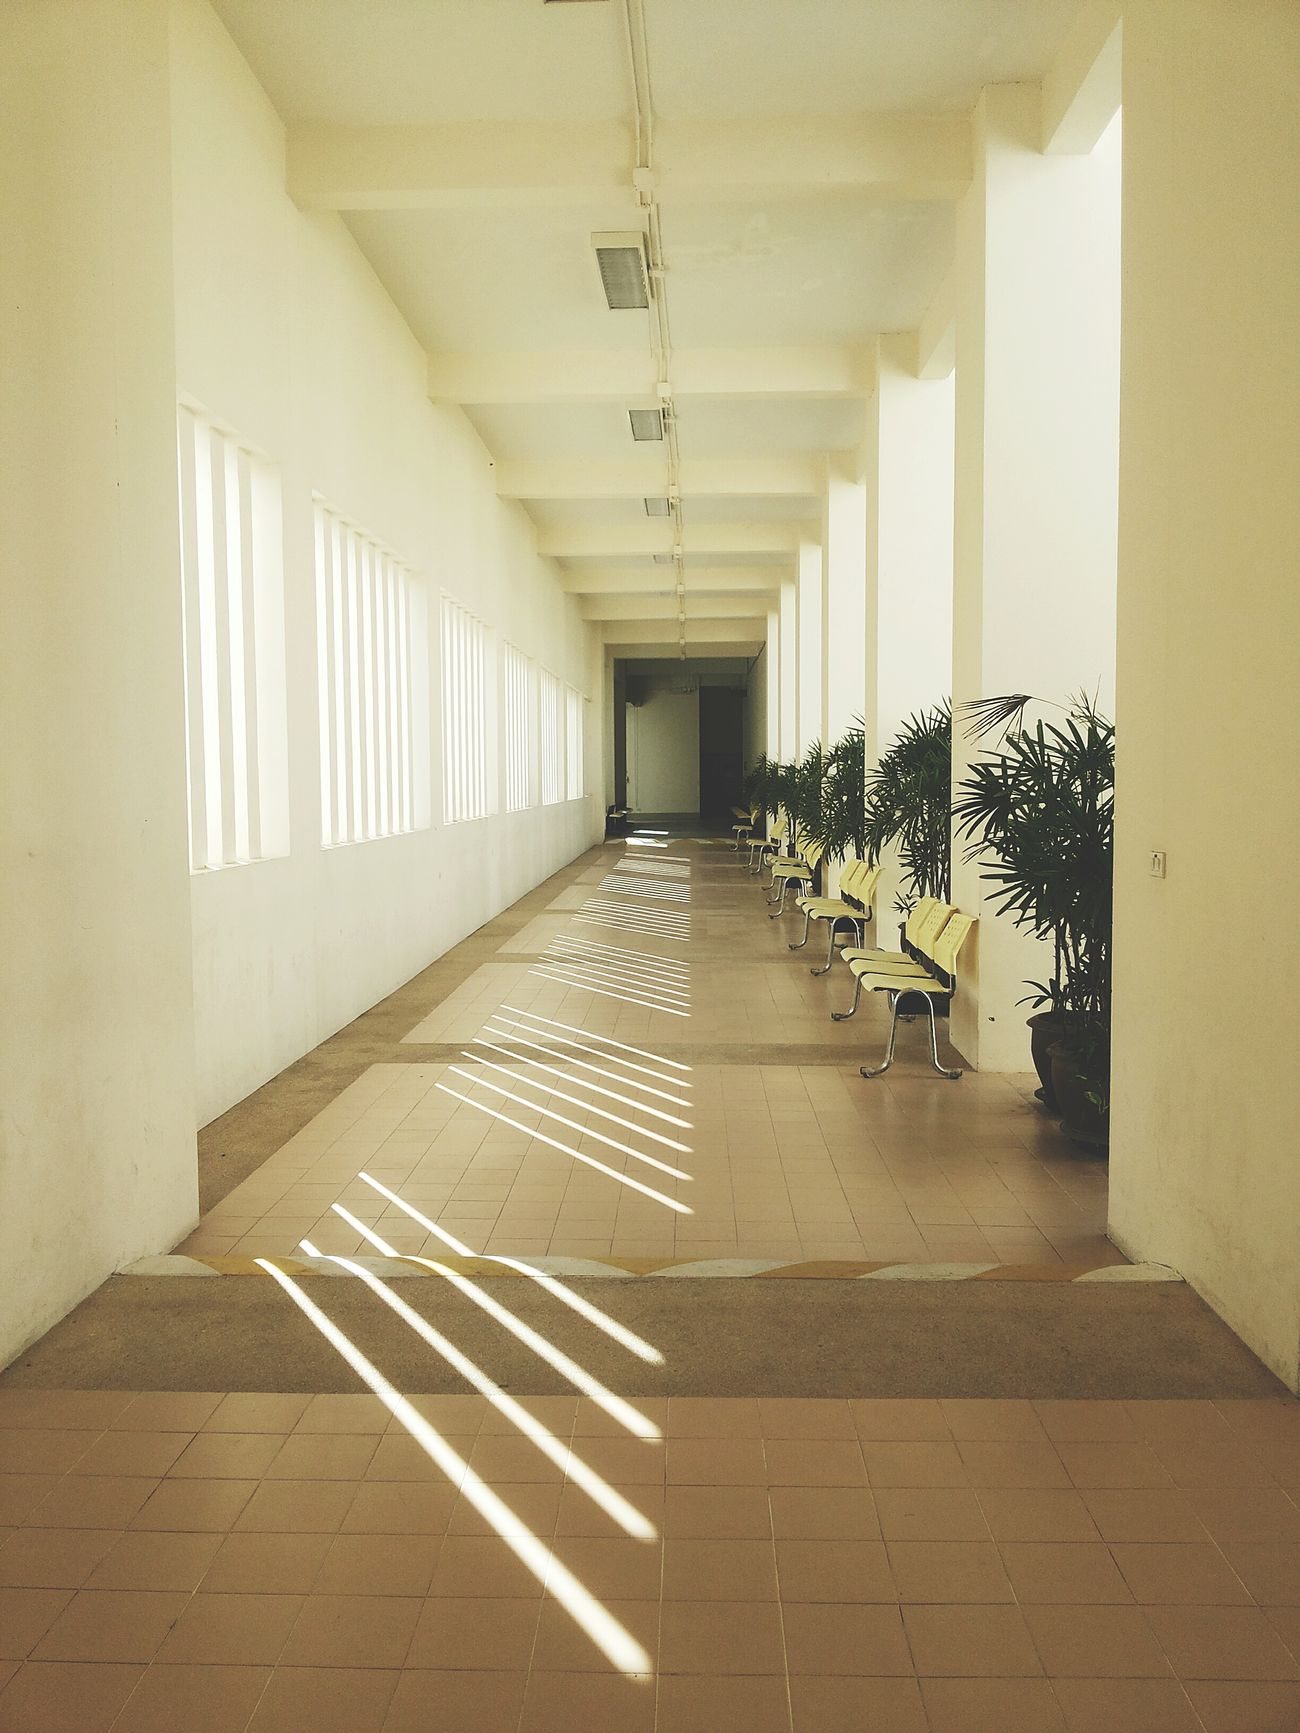 Light & Shodow Window Sunlight Shadow Exit Sign The Way Forward